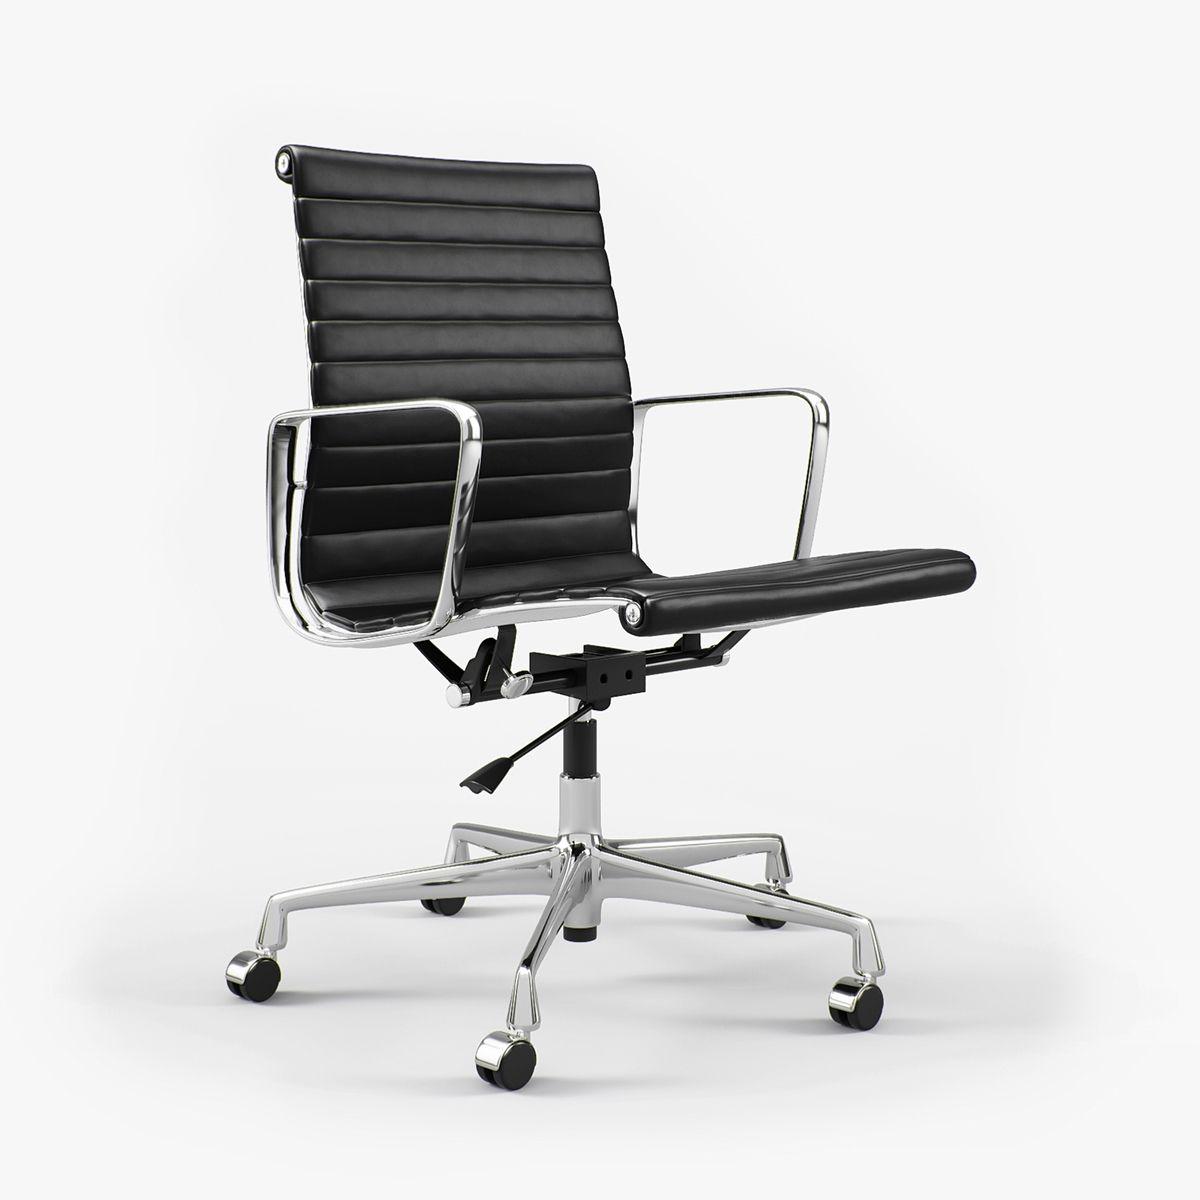 Vitra Charles Ray Eames Aluminium Chair Ea 117 I 3d Eames Bürostuhl Modernes Möbeldesign Bürostuhl